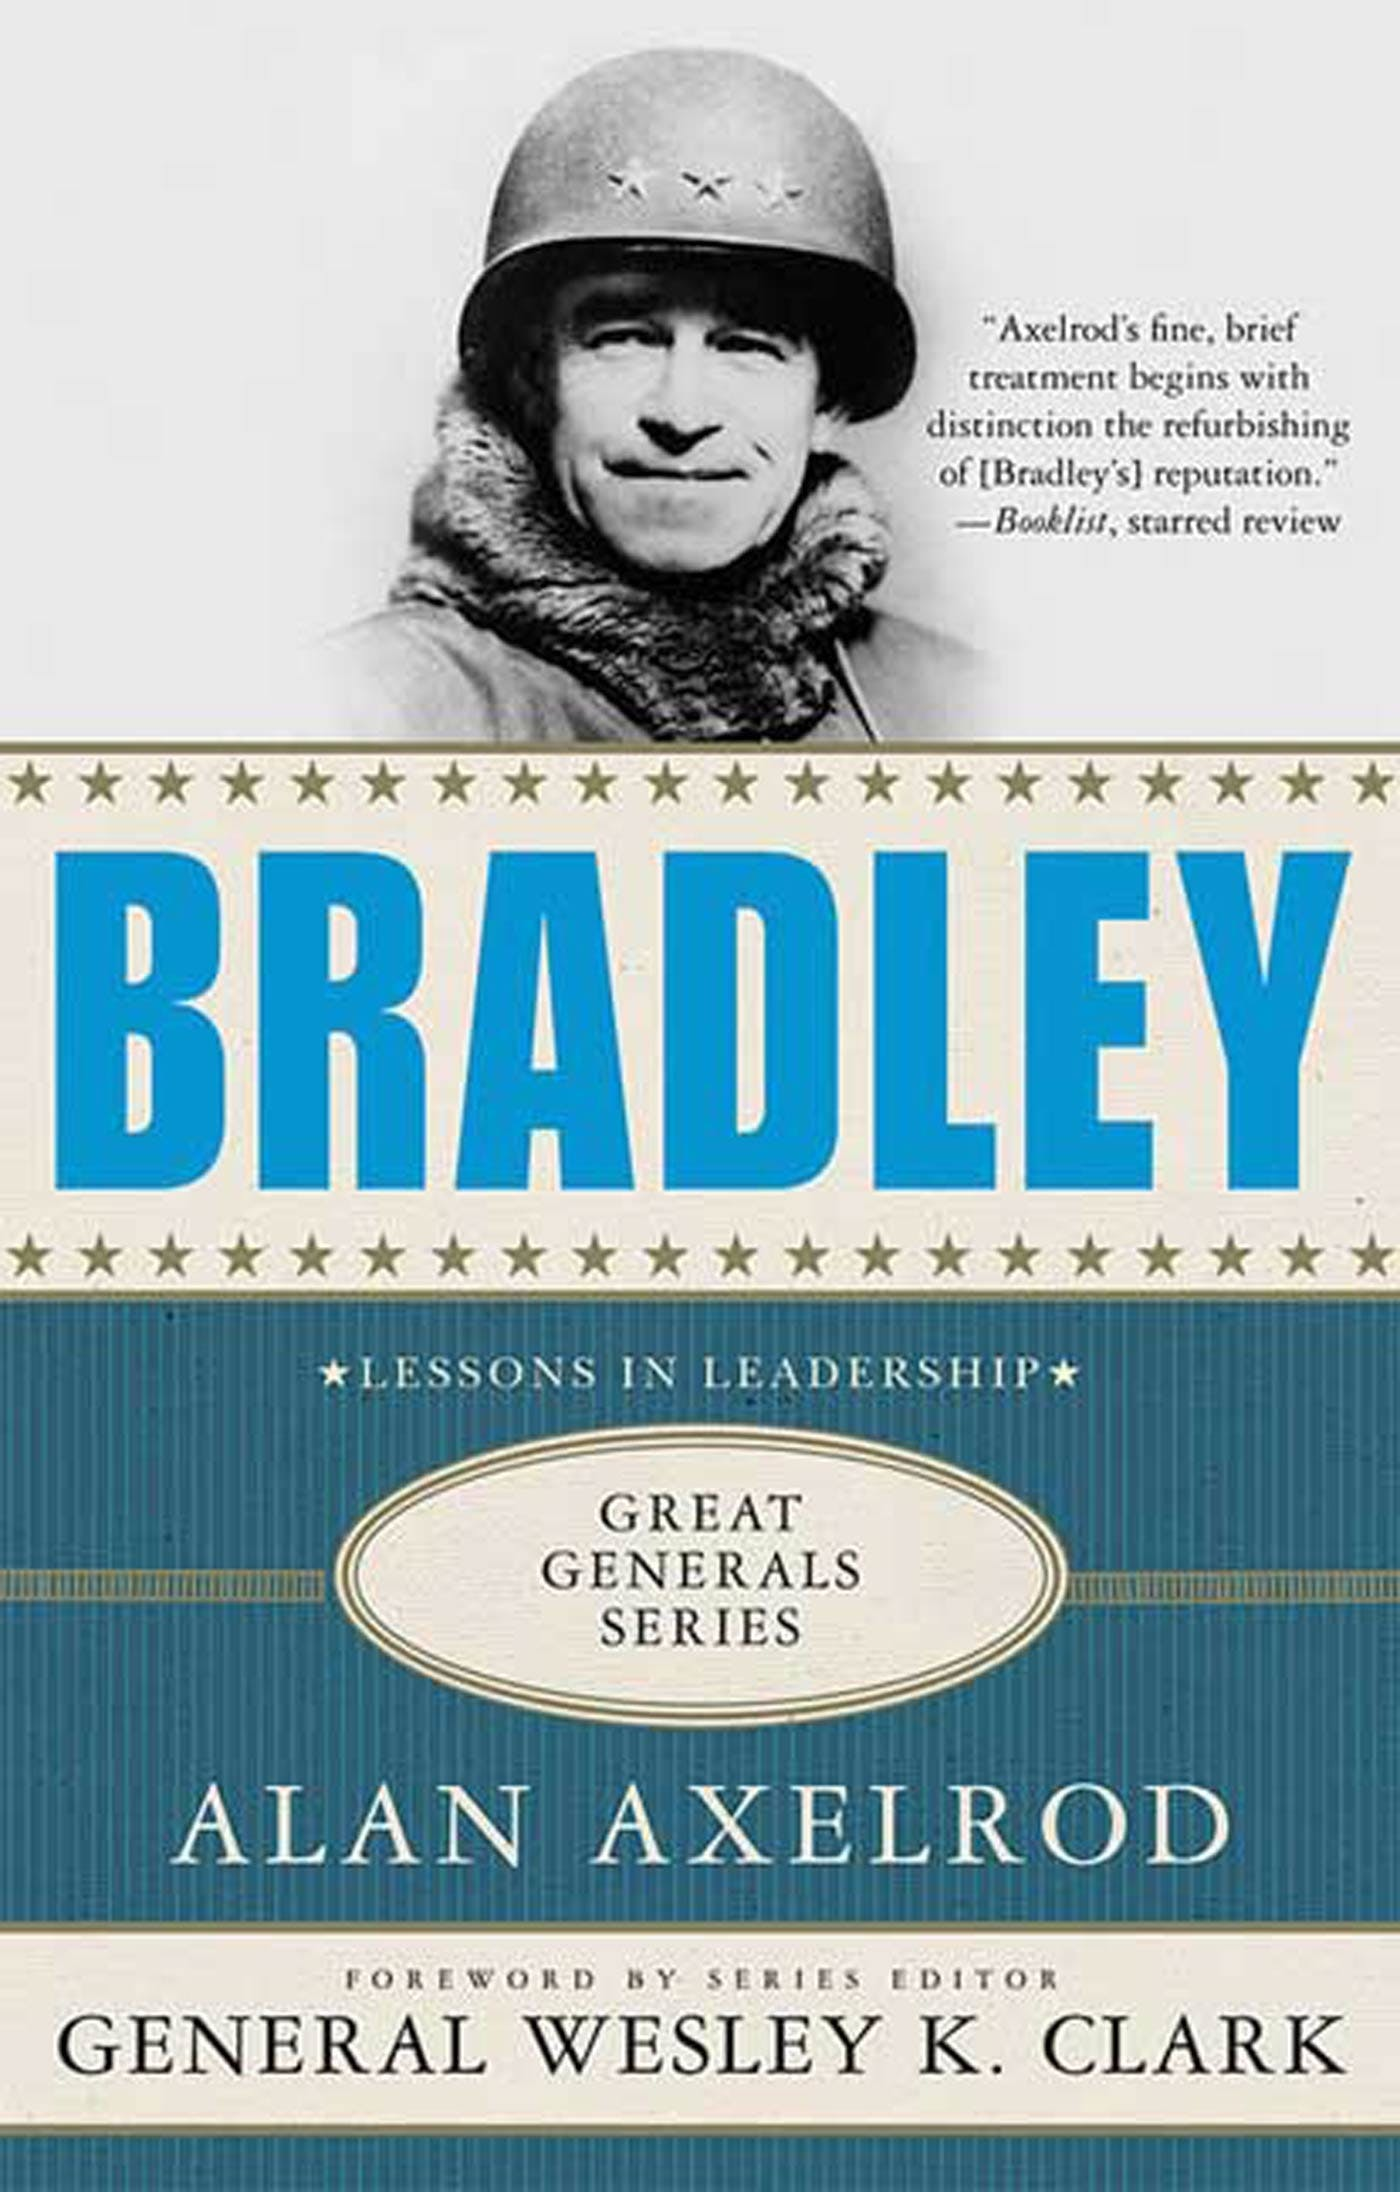 Image of Bradley: A Biography